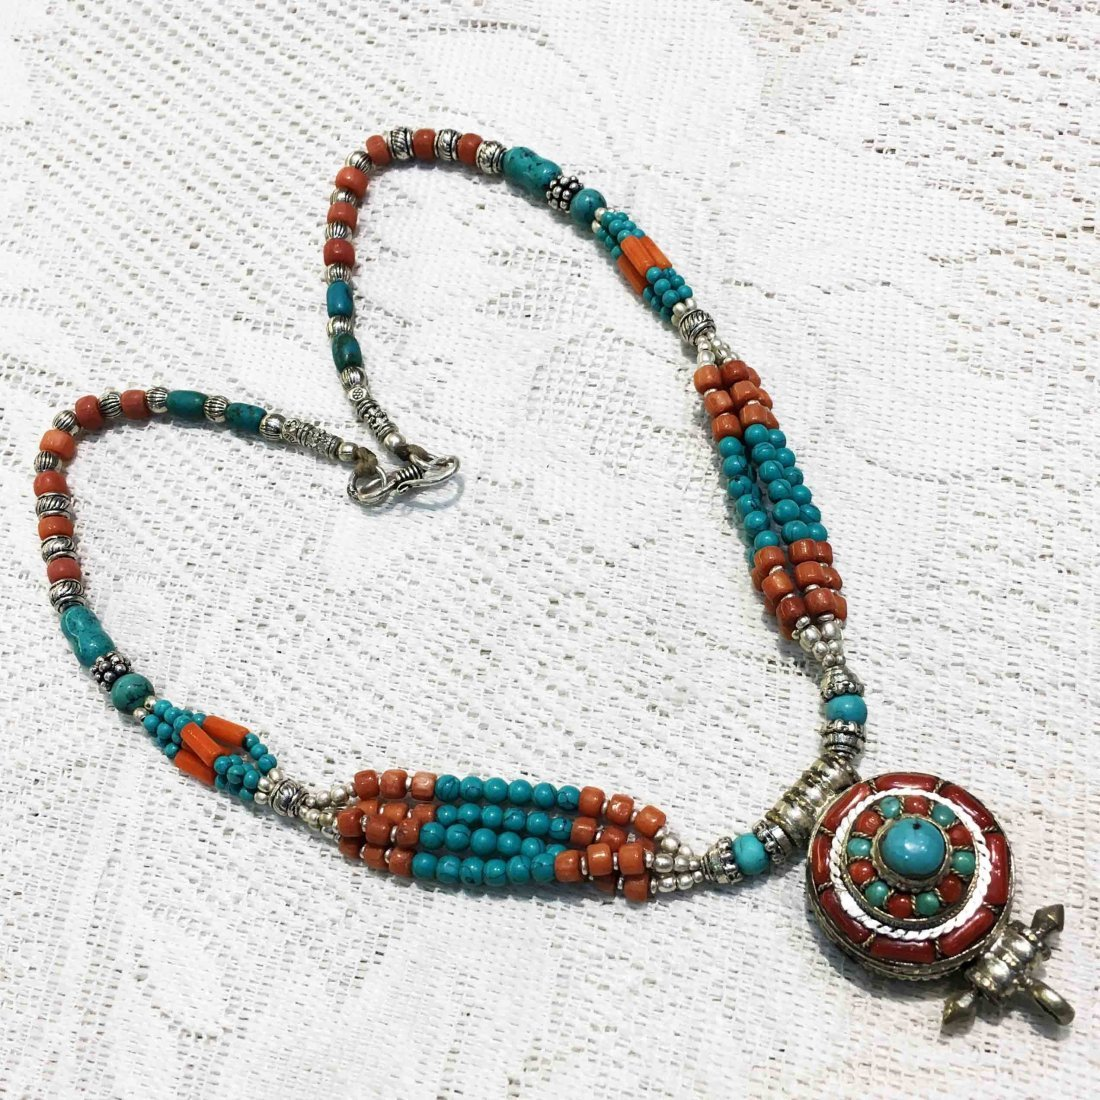 Ethnic Jewelry Vintage Lapis & Coral Necklace